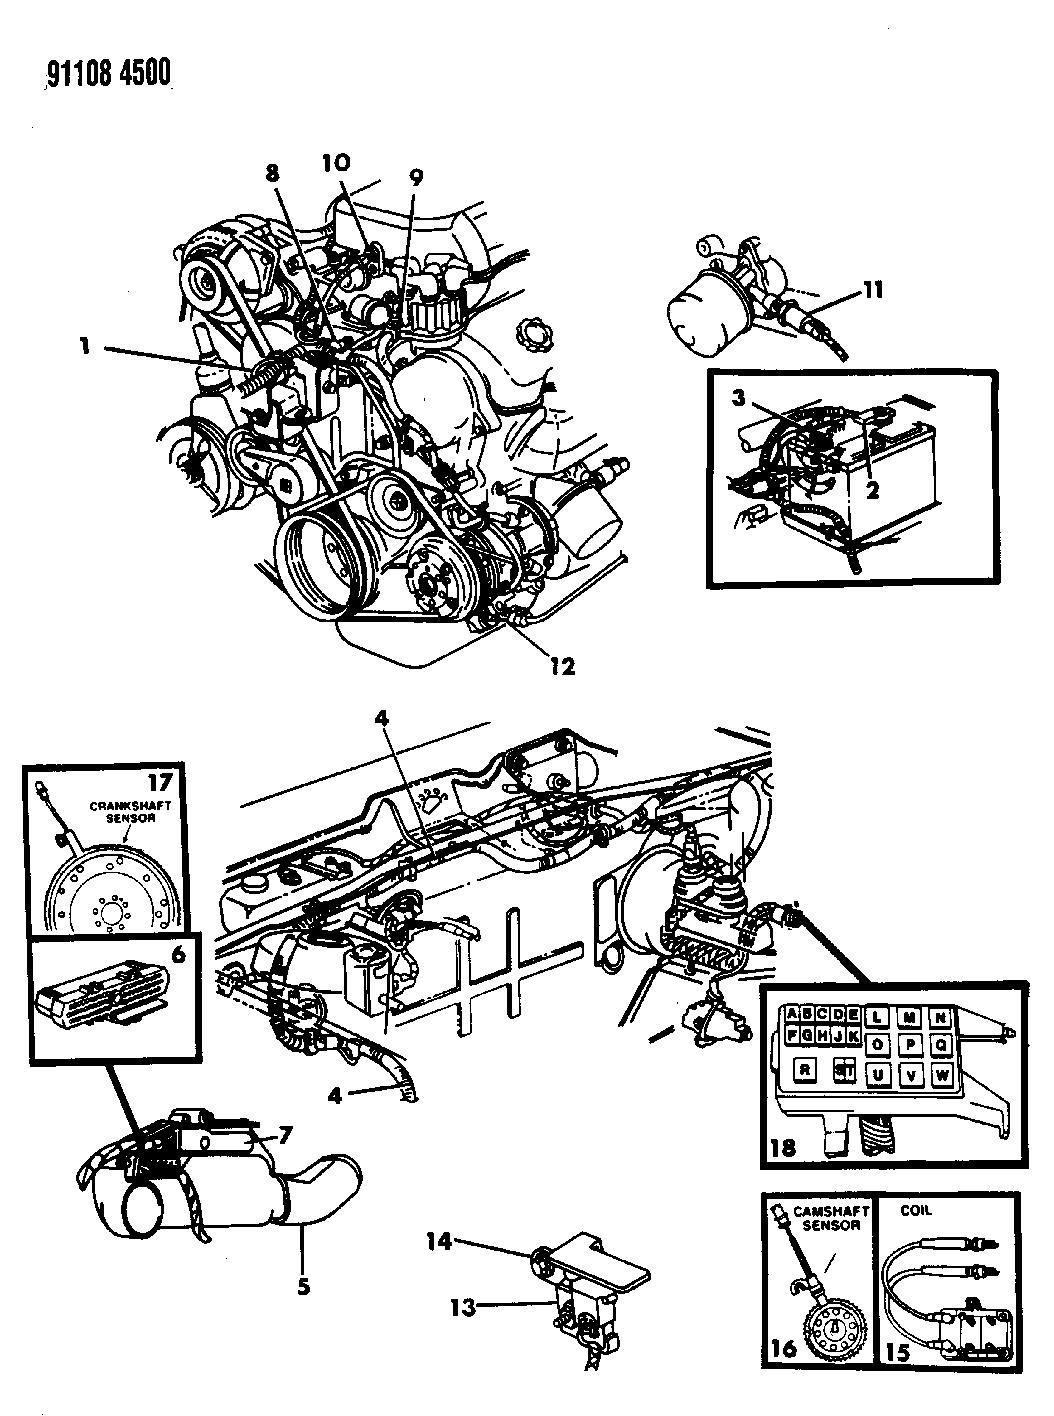 r4686430